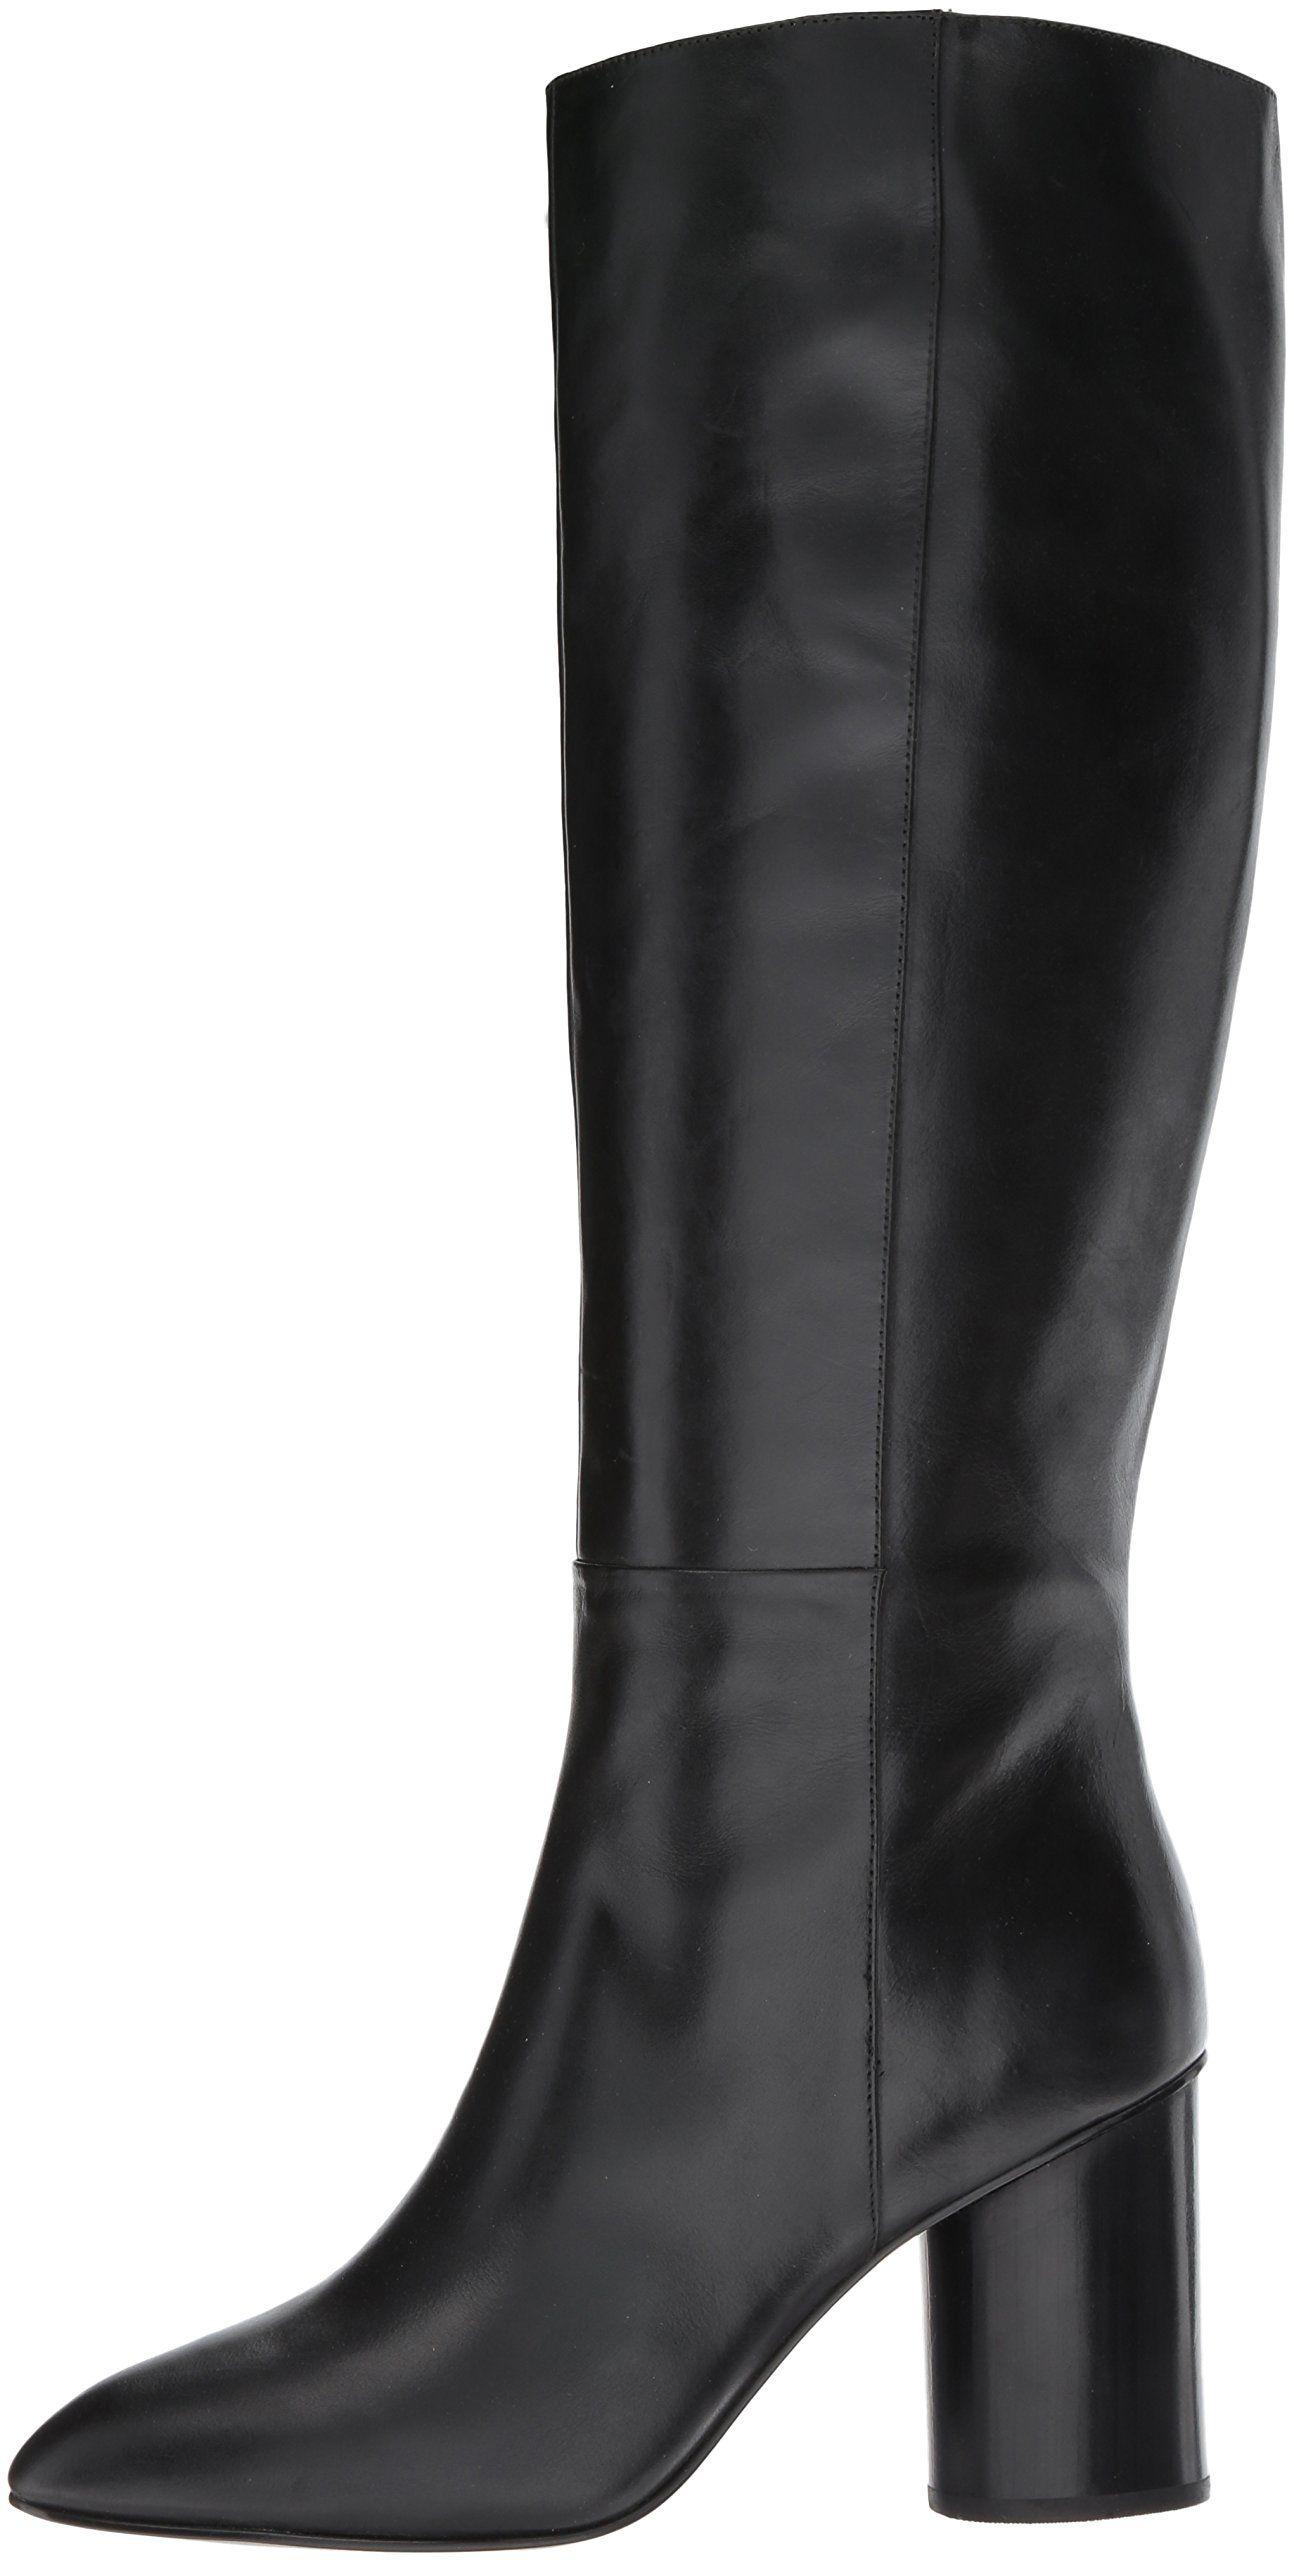 669d7422b0c Nine West Womens Christie Knee High Boot Black Leather 8 Medium US ...